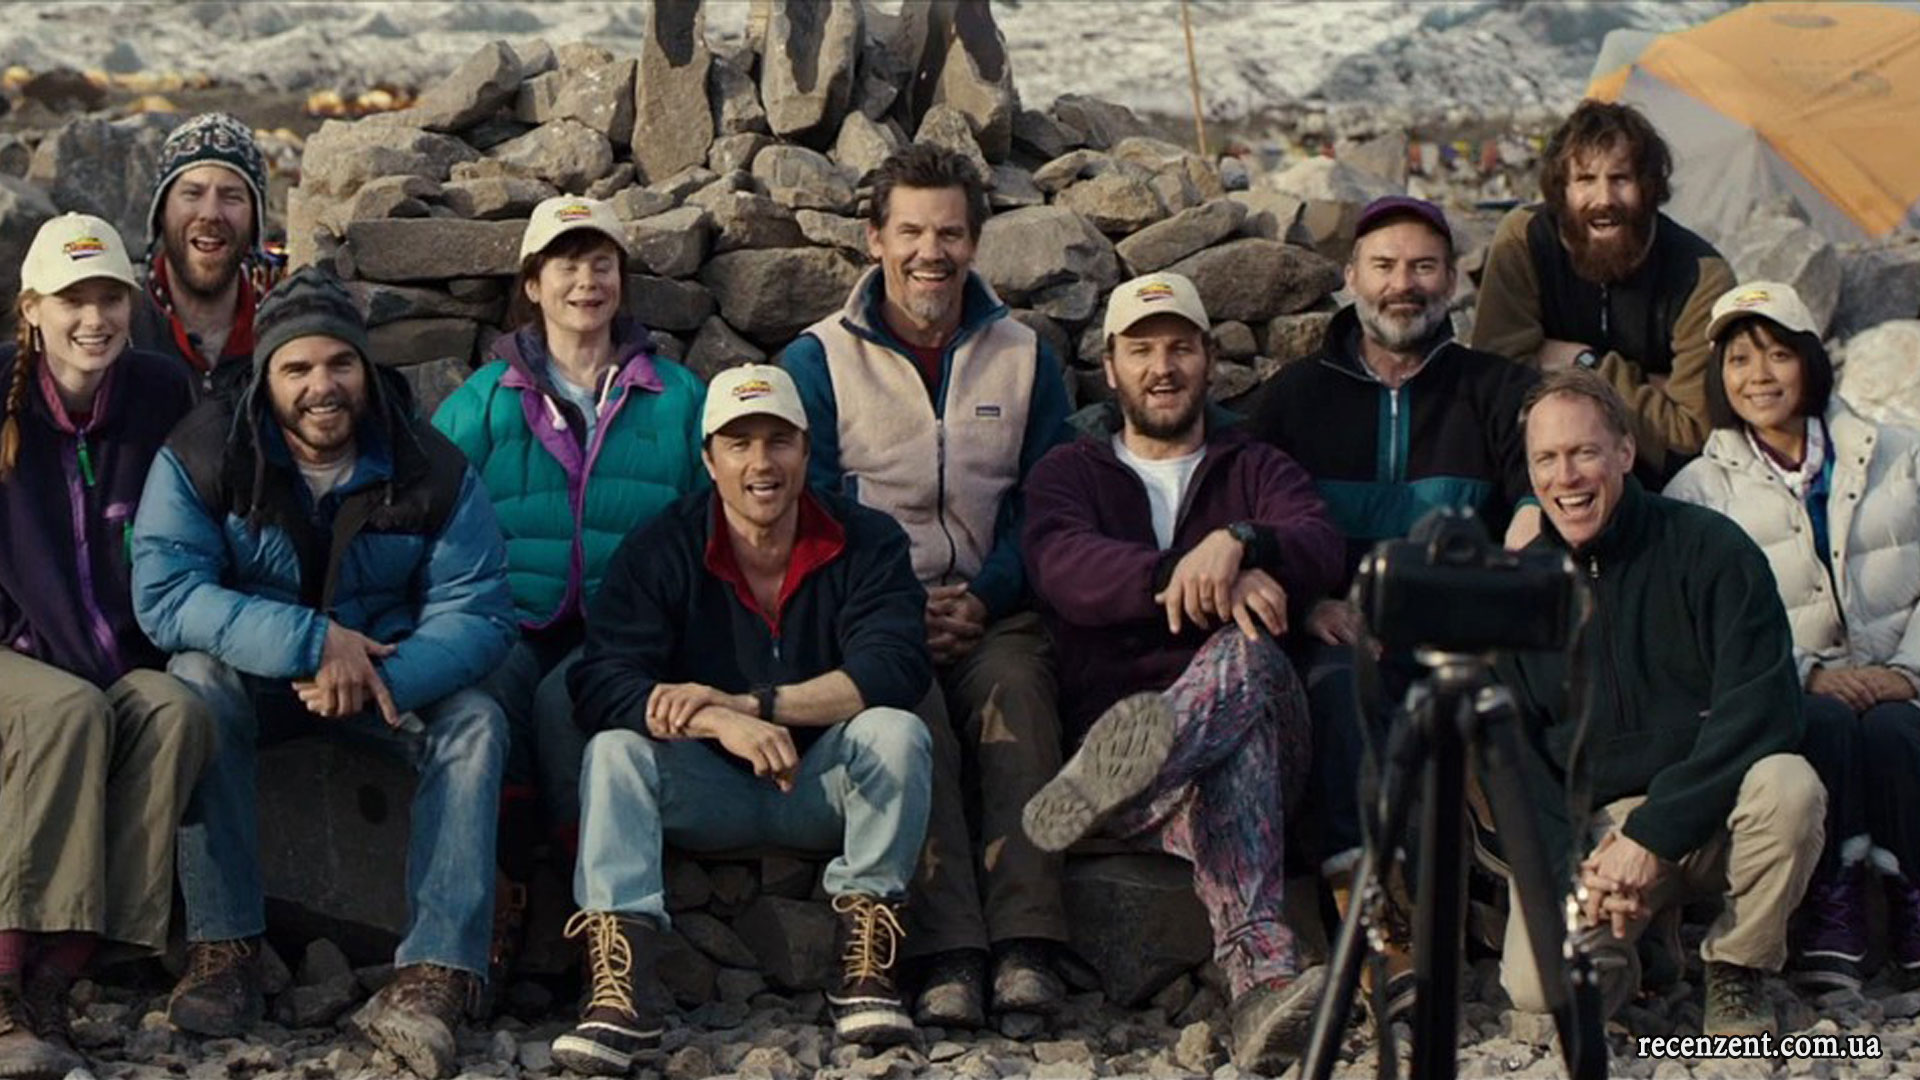 018-everest-movie-film-2015-screenshots-photo-real-story-adventure-consultants-recenzent_com_ua.jpg